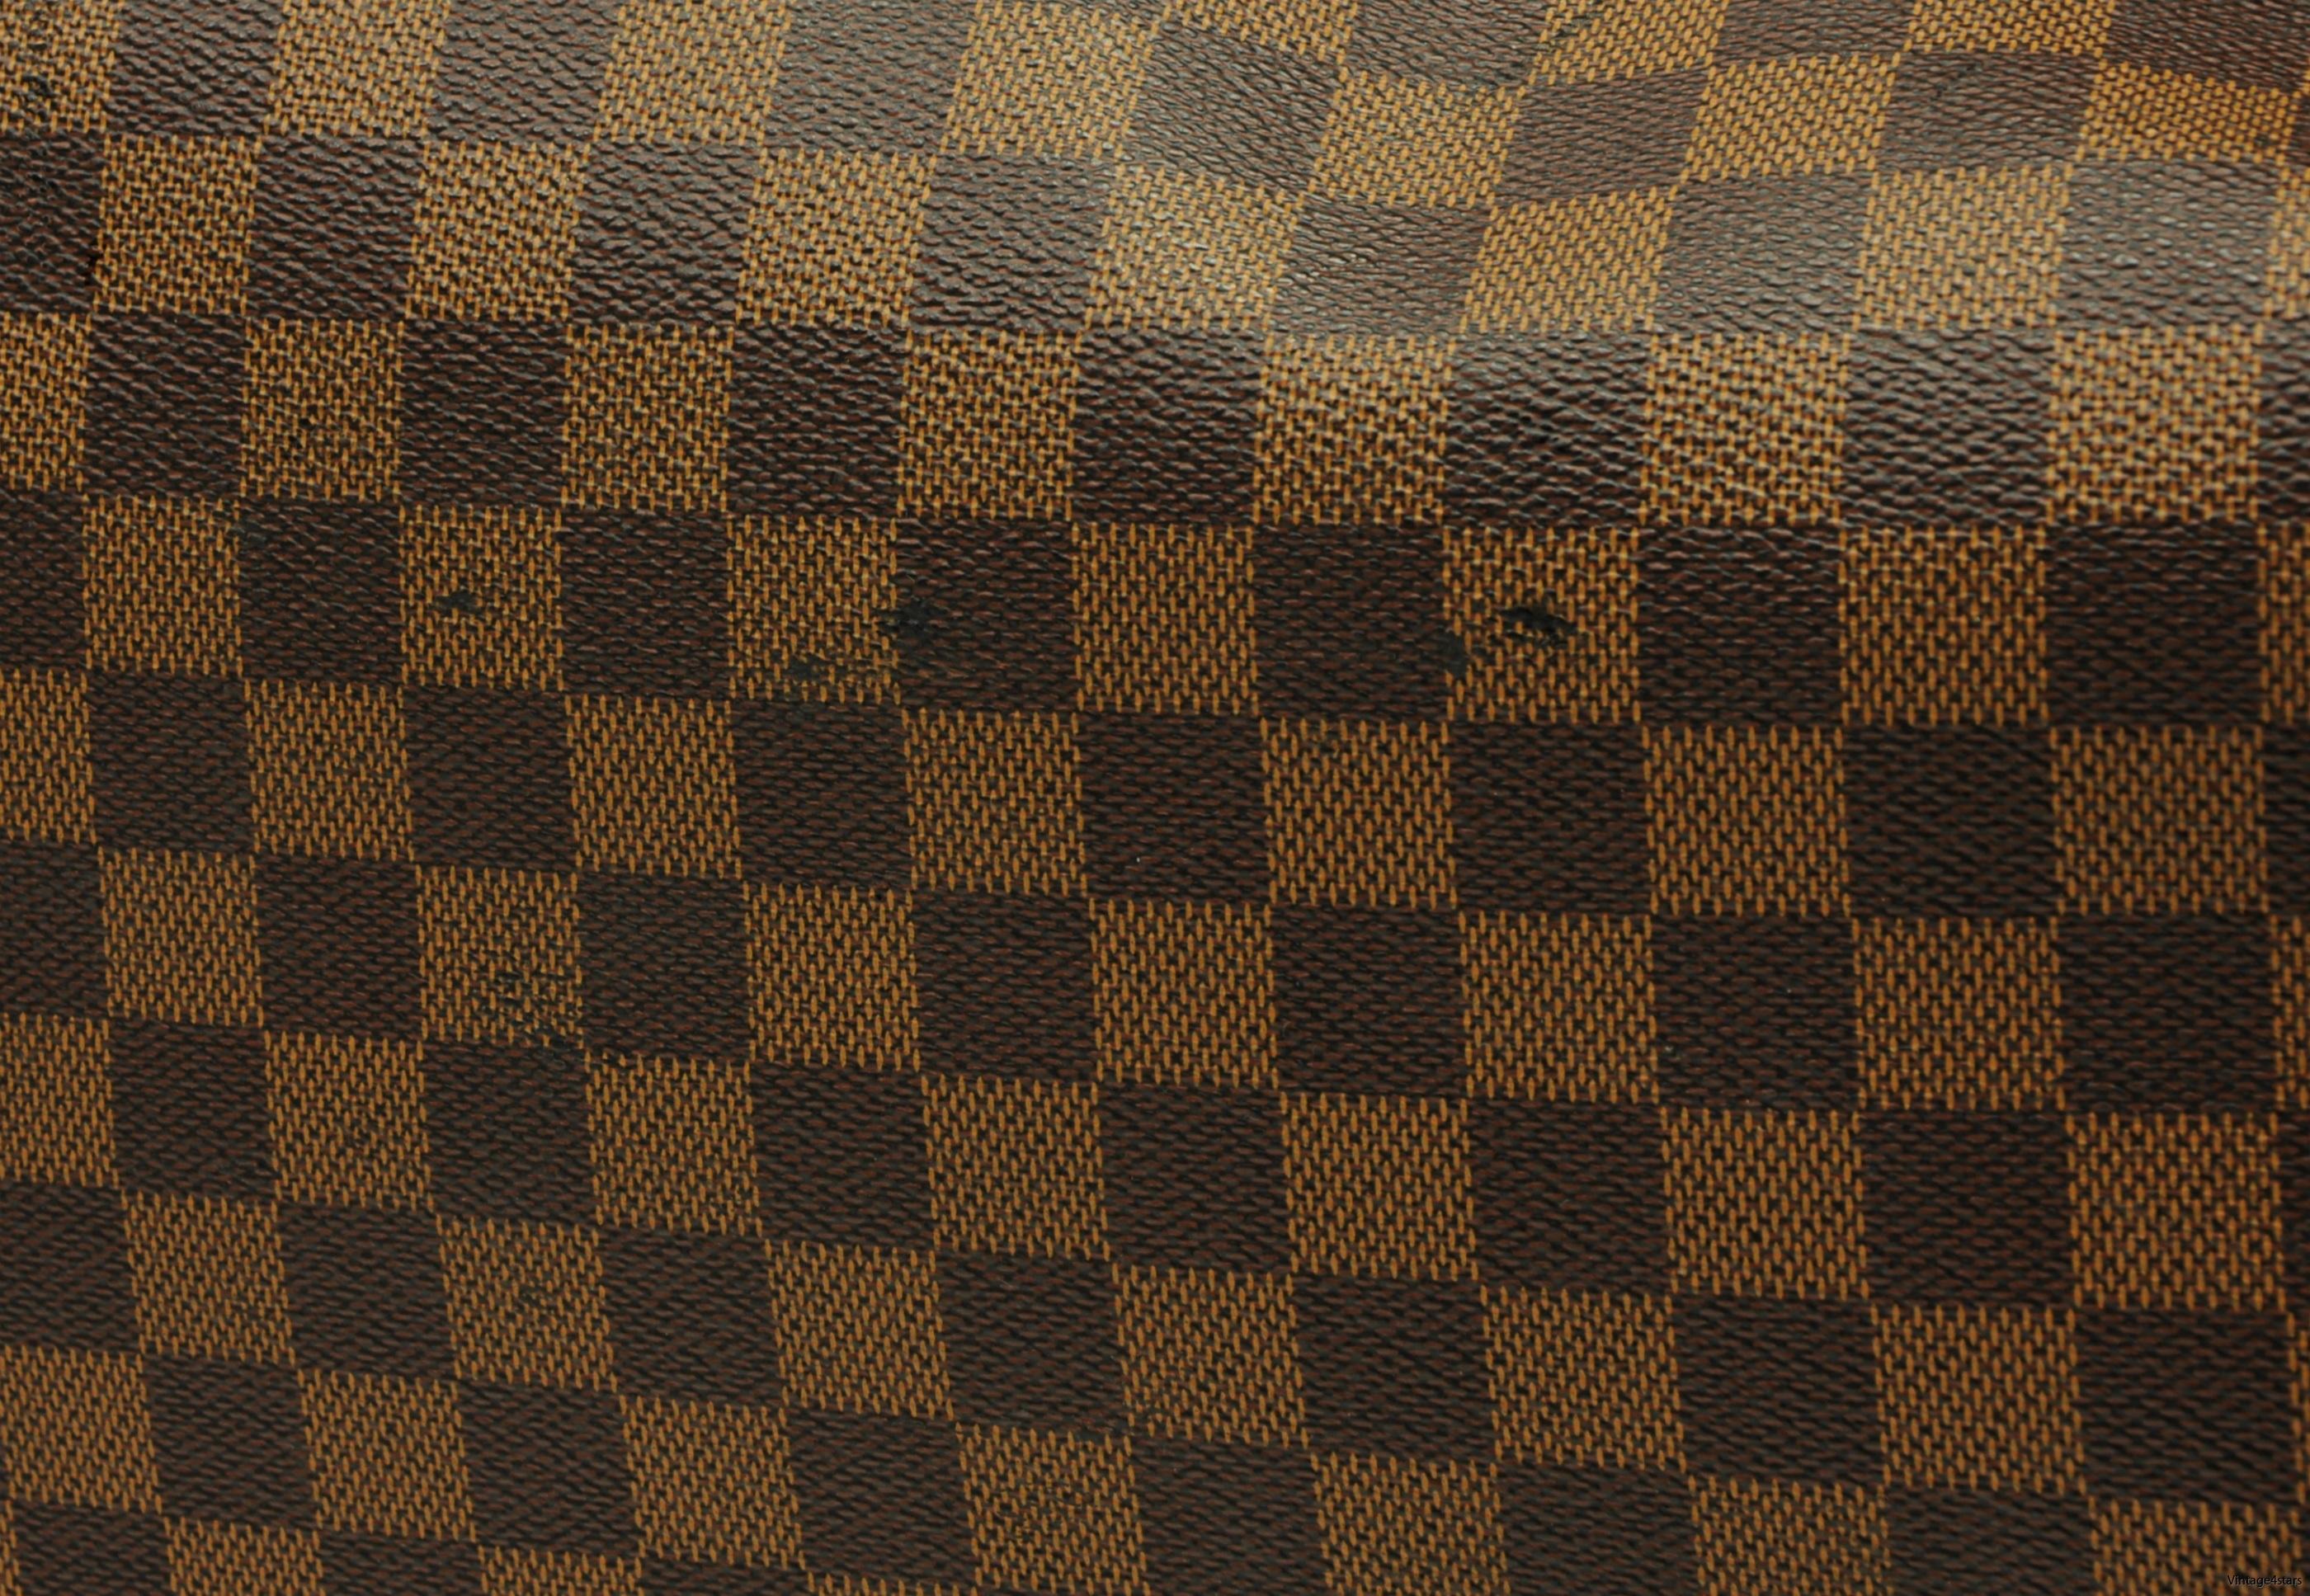 Louis Vuitton Eole 60 Damier Ebene 8